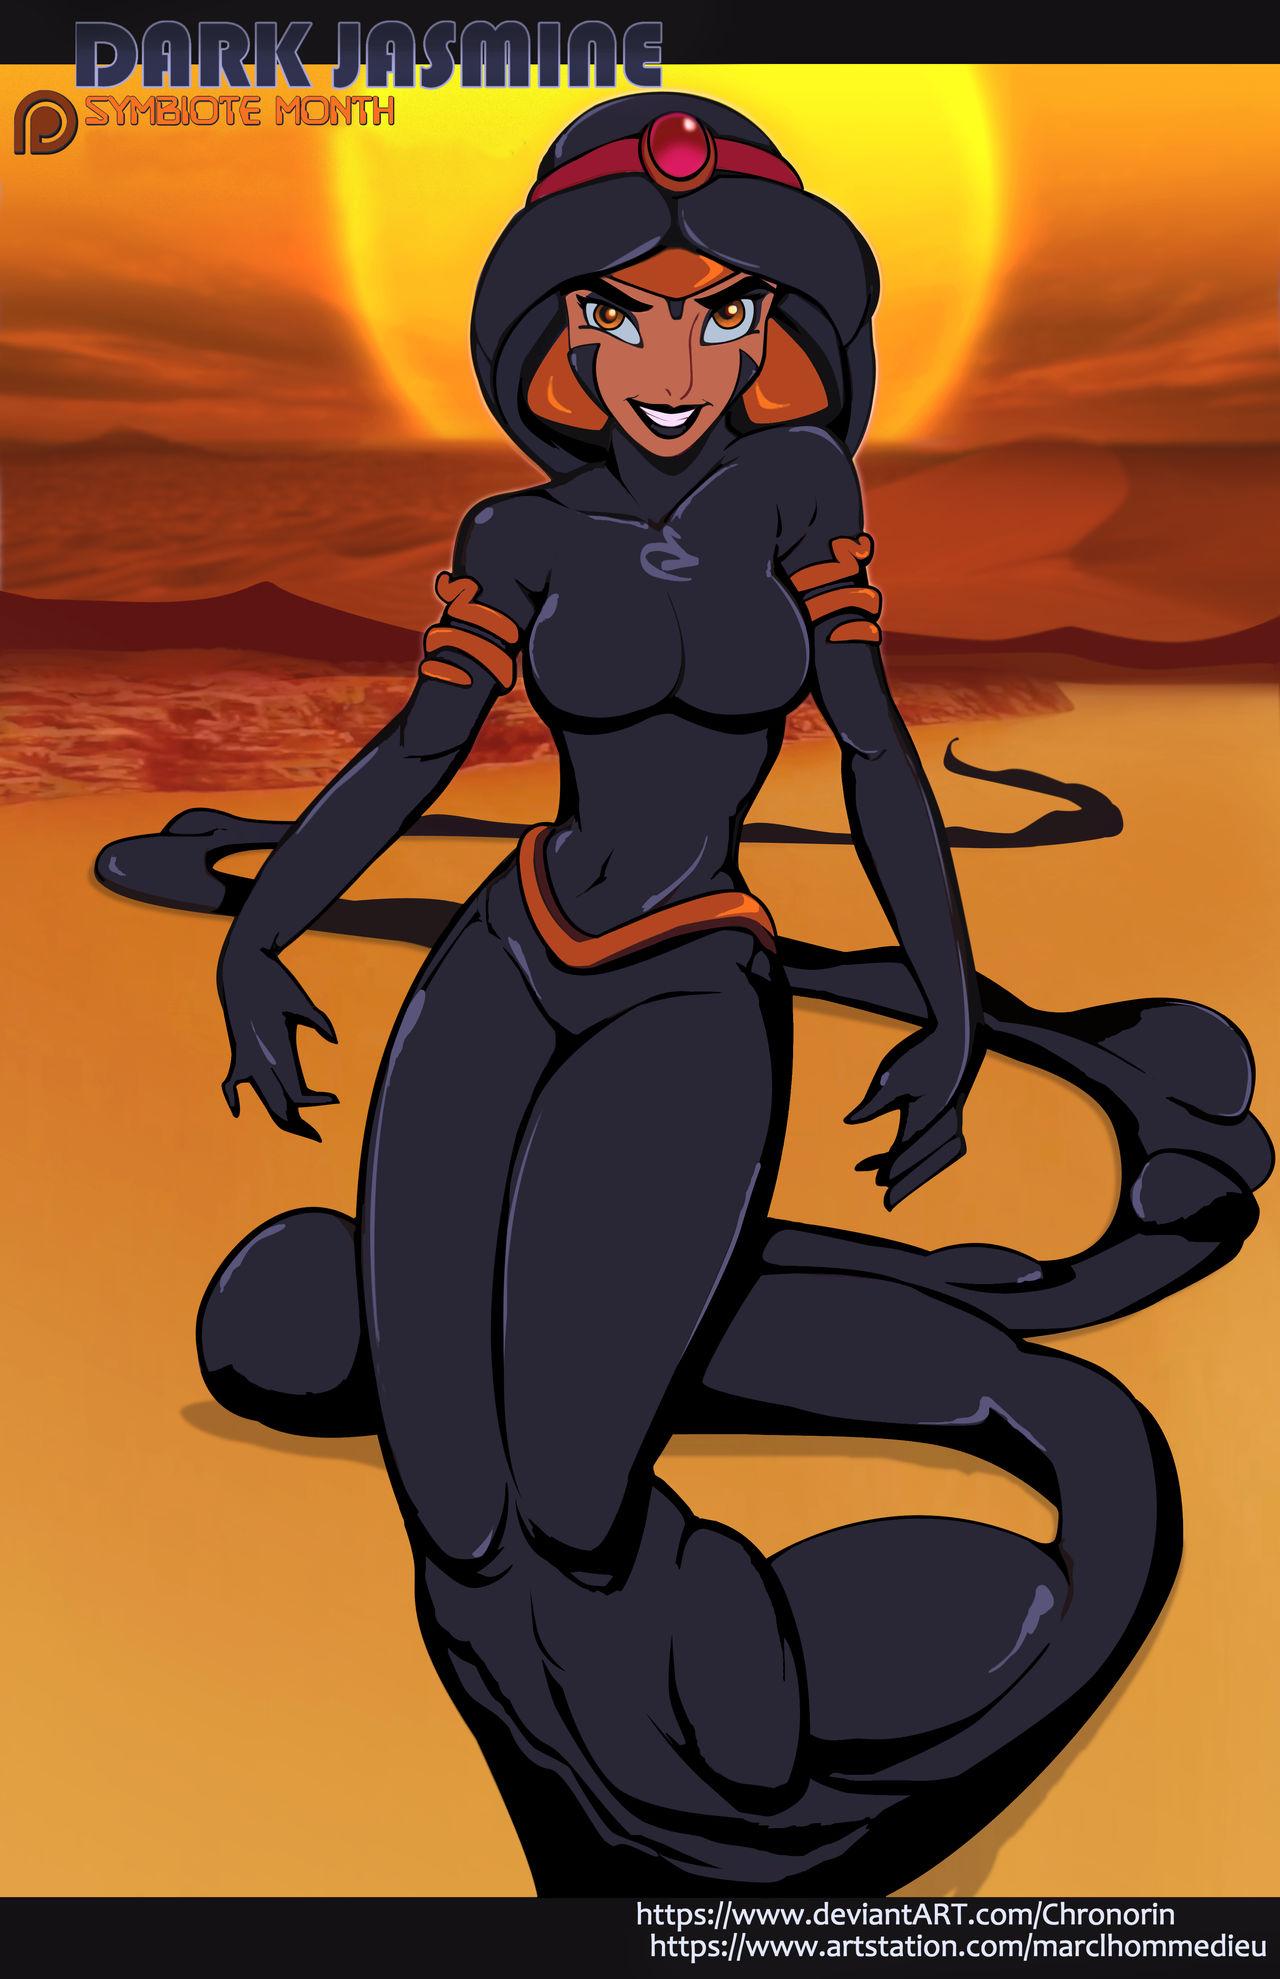 Symbiote VII: Dark Jasmine